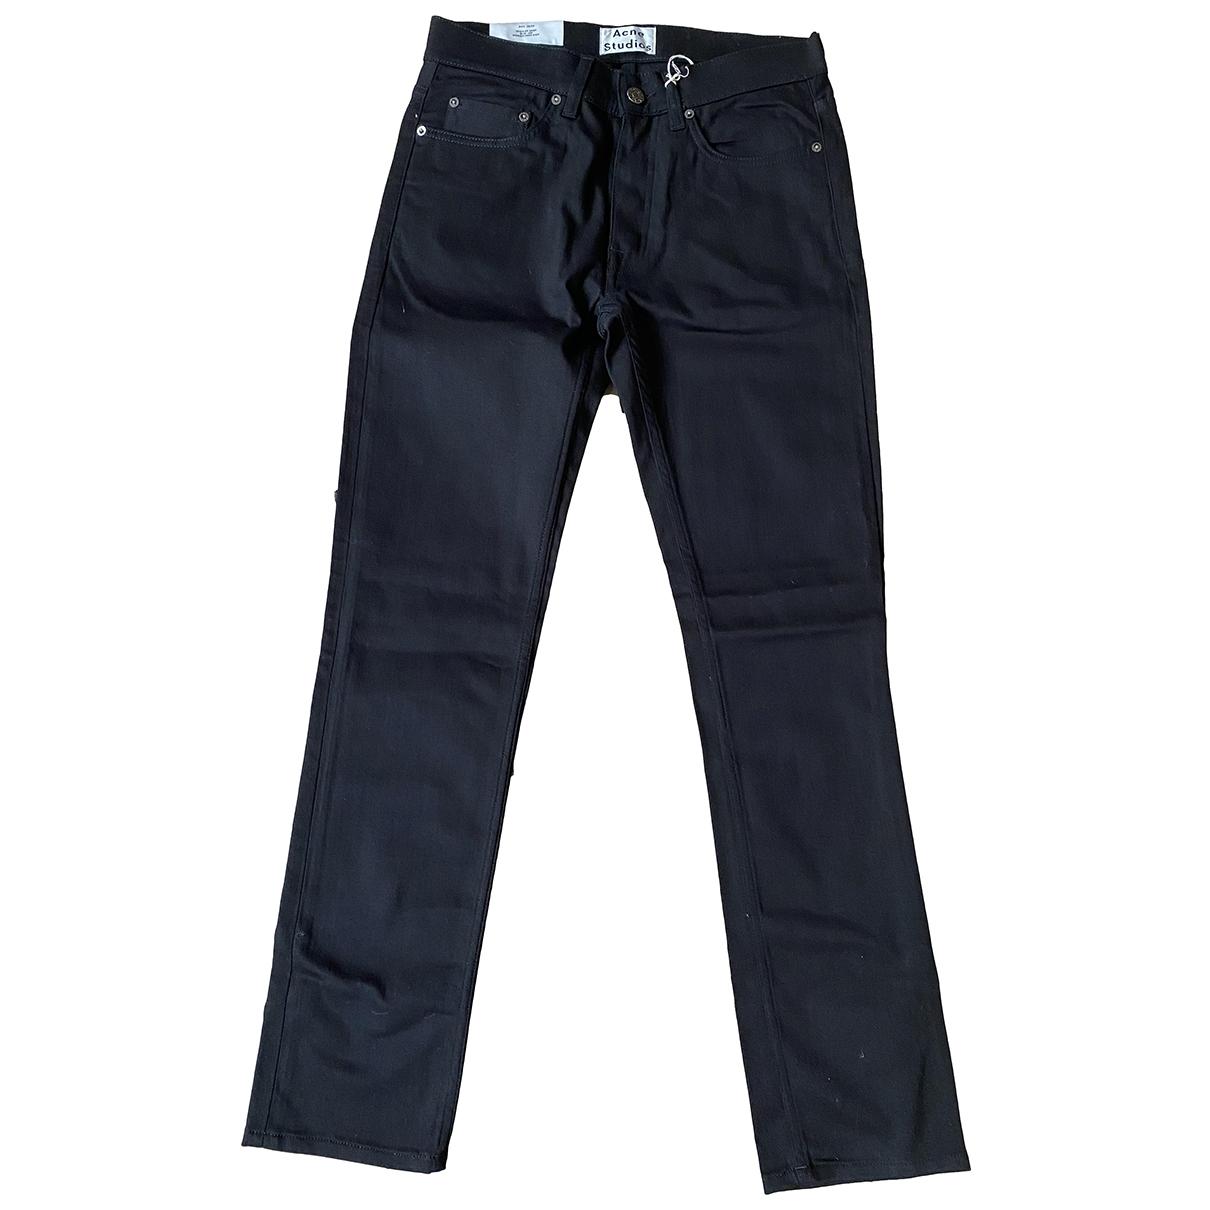 Acne Studios \N Black Cotton - elasthane Jeans for Men 30 US